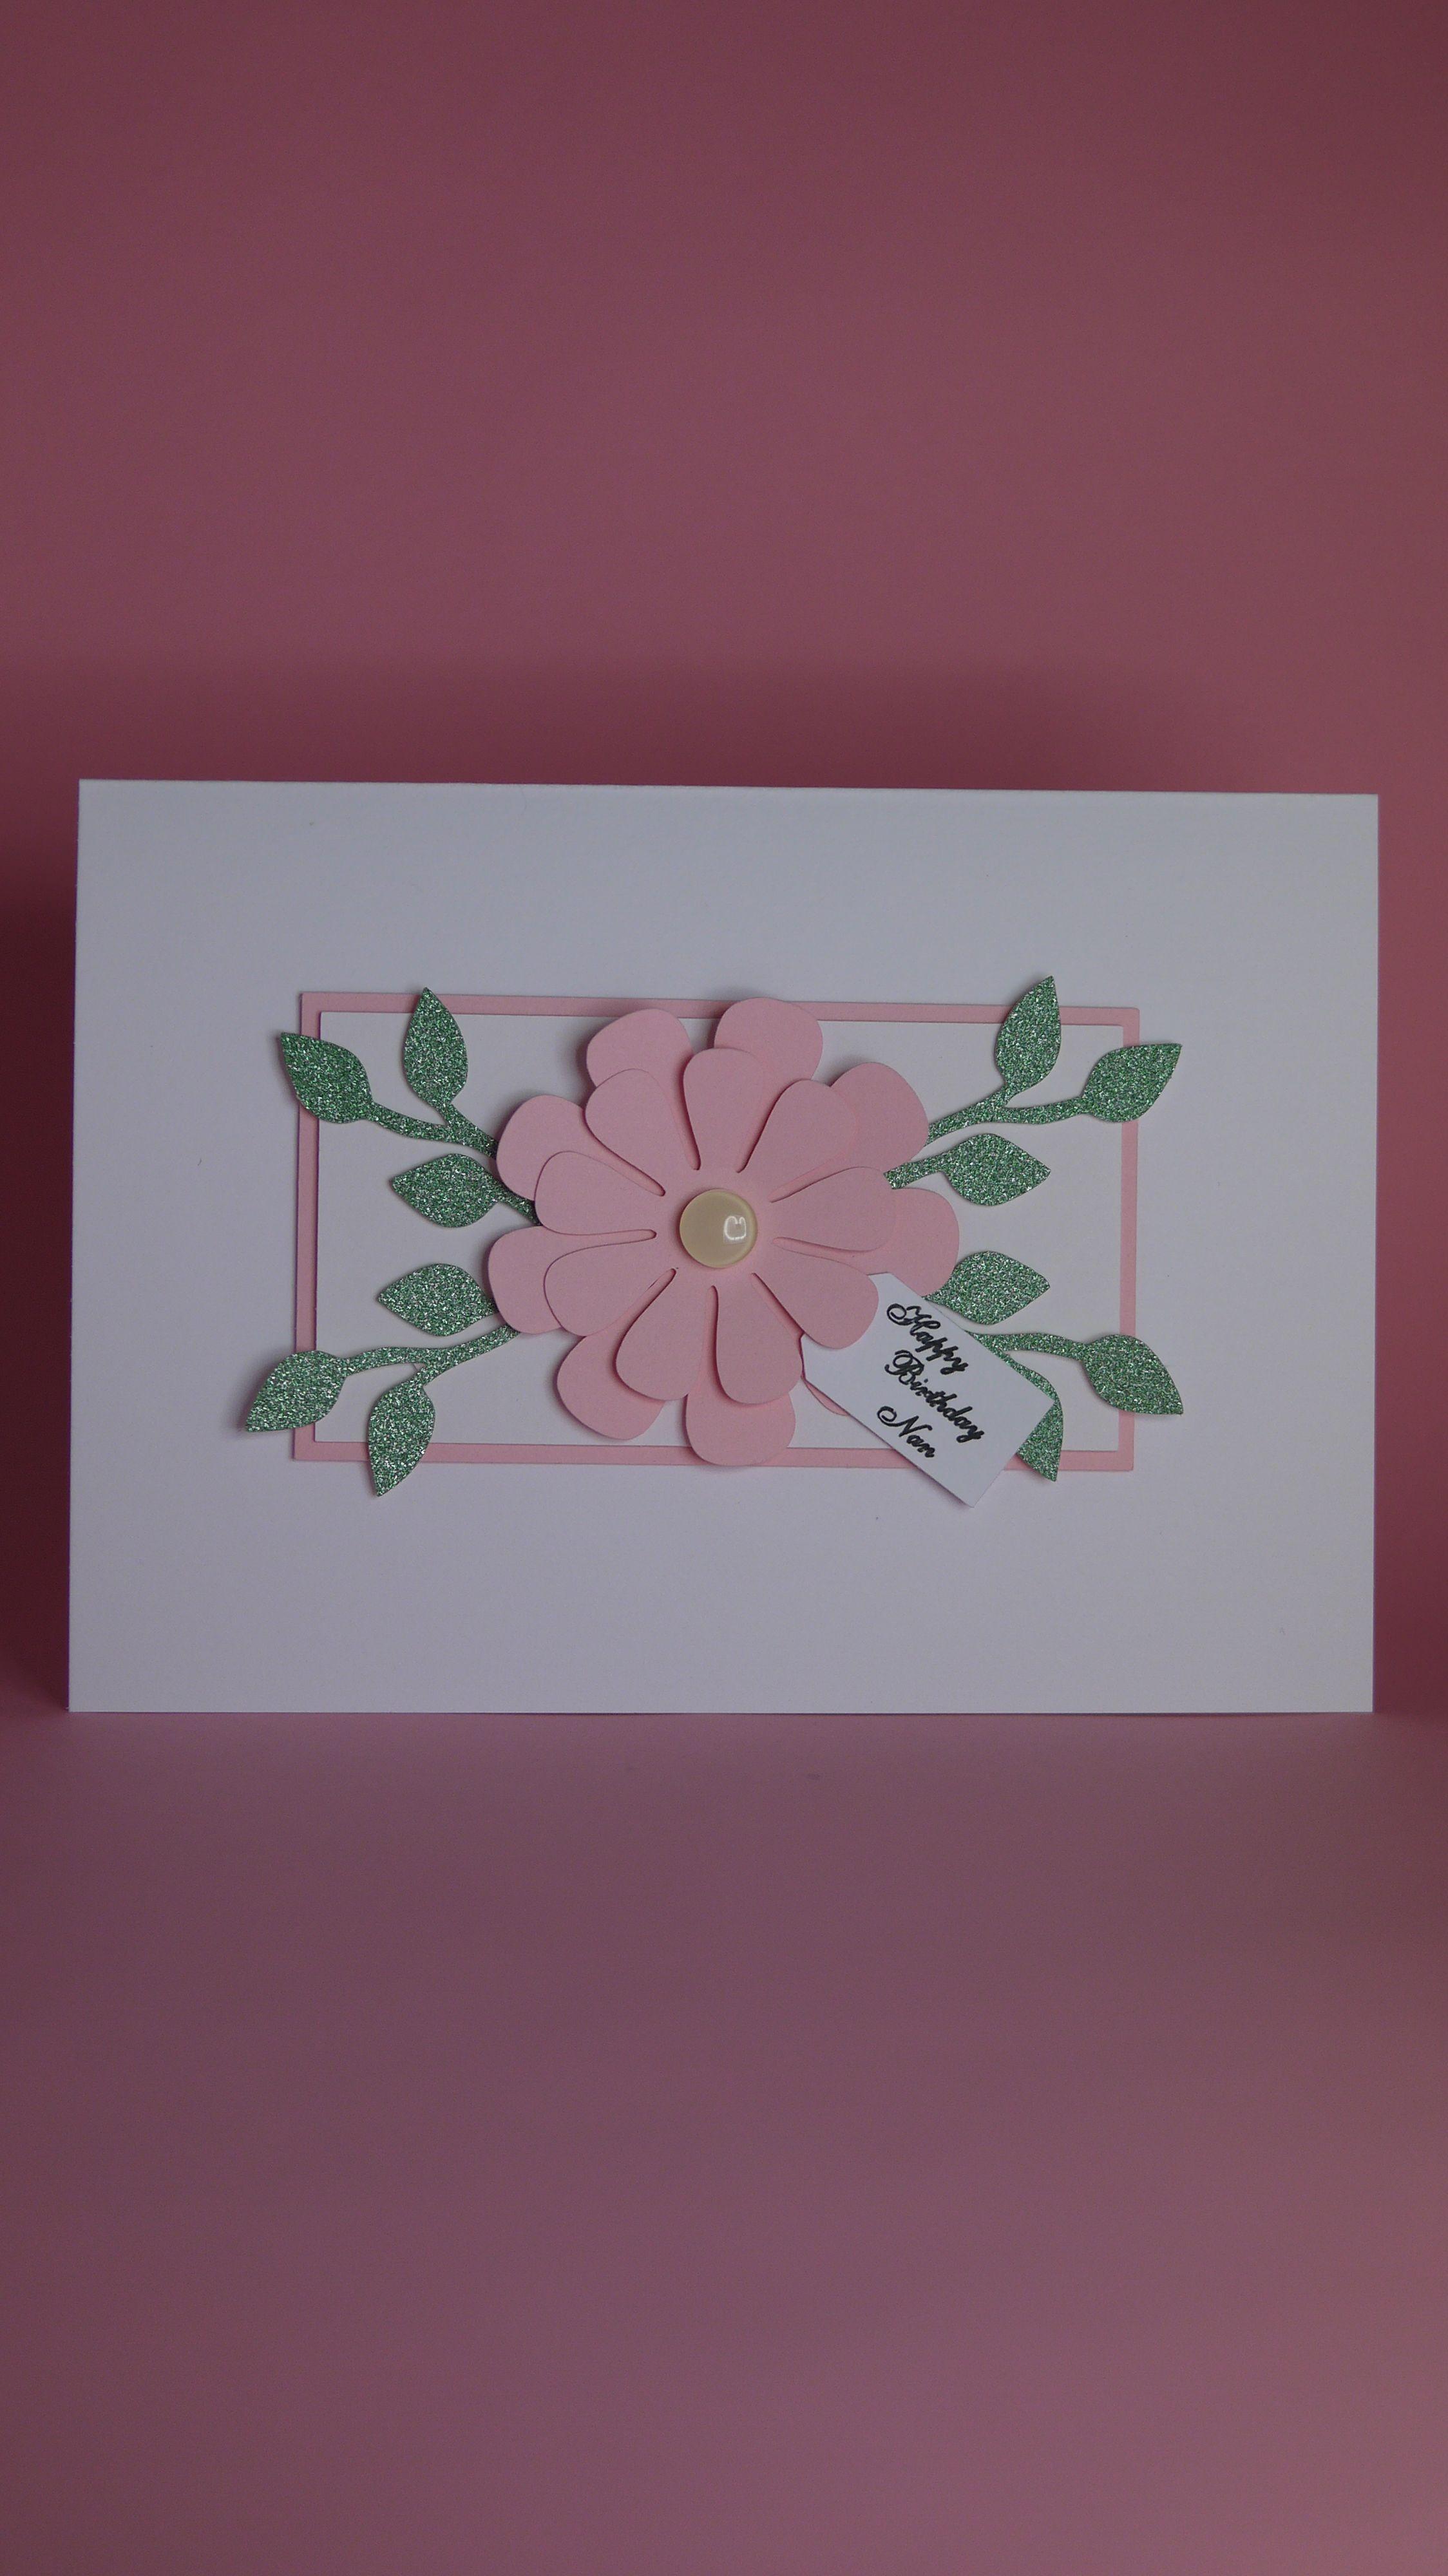 Handmade pink flower birthday card birthday card for her female handmade pink flower birthday card birthday card for her female birthday card pink flower birthday card card with flowers pretty flower izmirmasajfo Choice Image